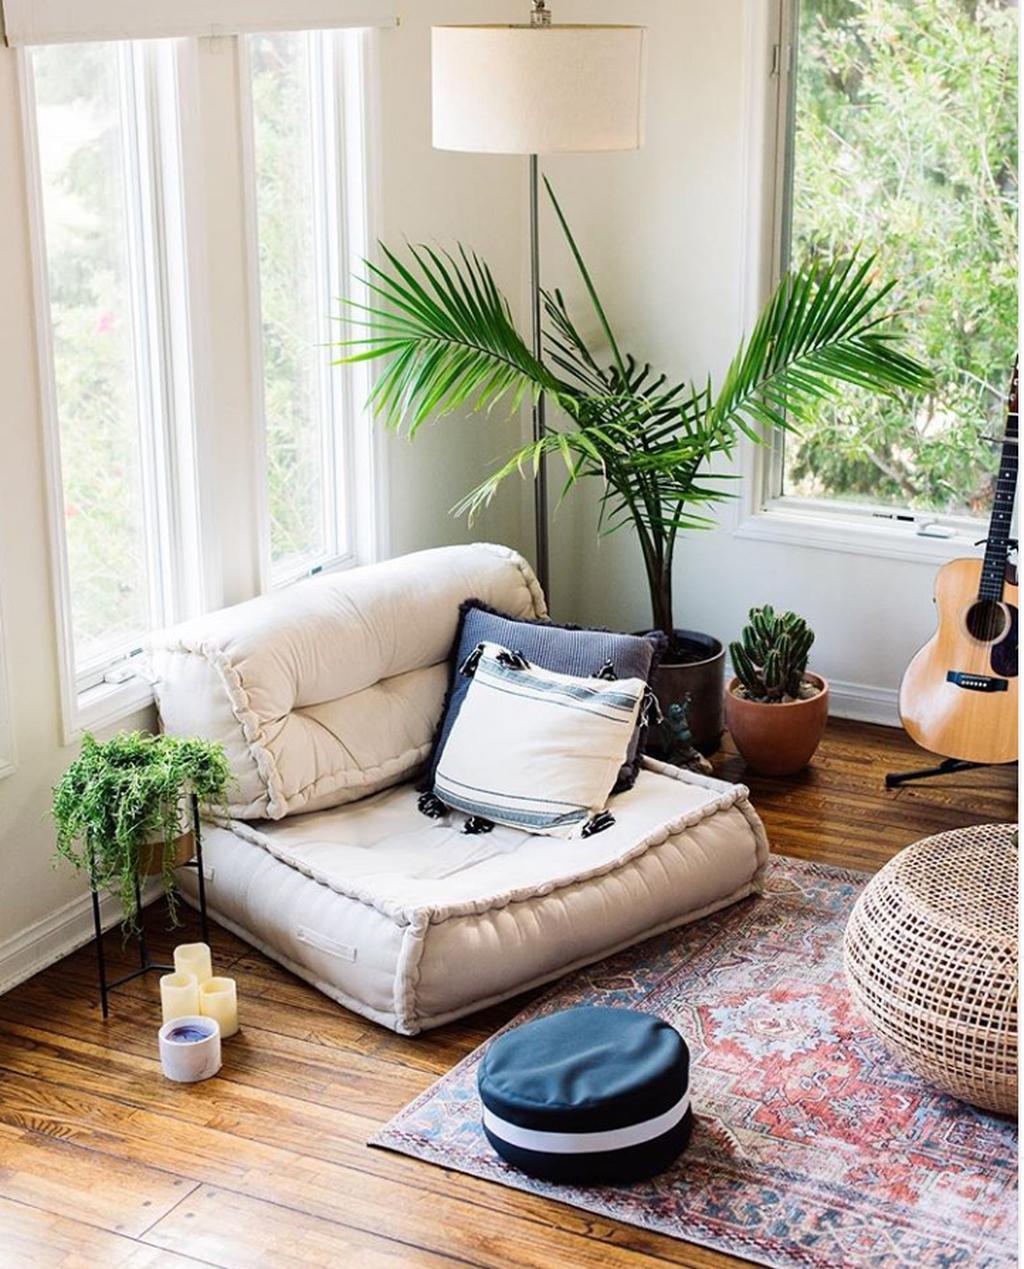 31 Admirable Cozy Living Room Decor Ideas Trendehouse Home Yoga Room Meditation Room Decor Living Room Diy